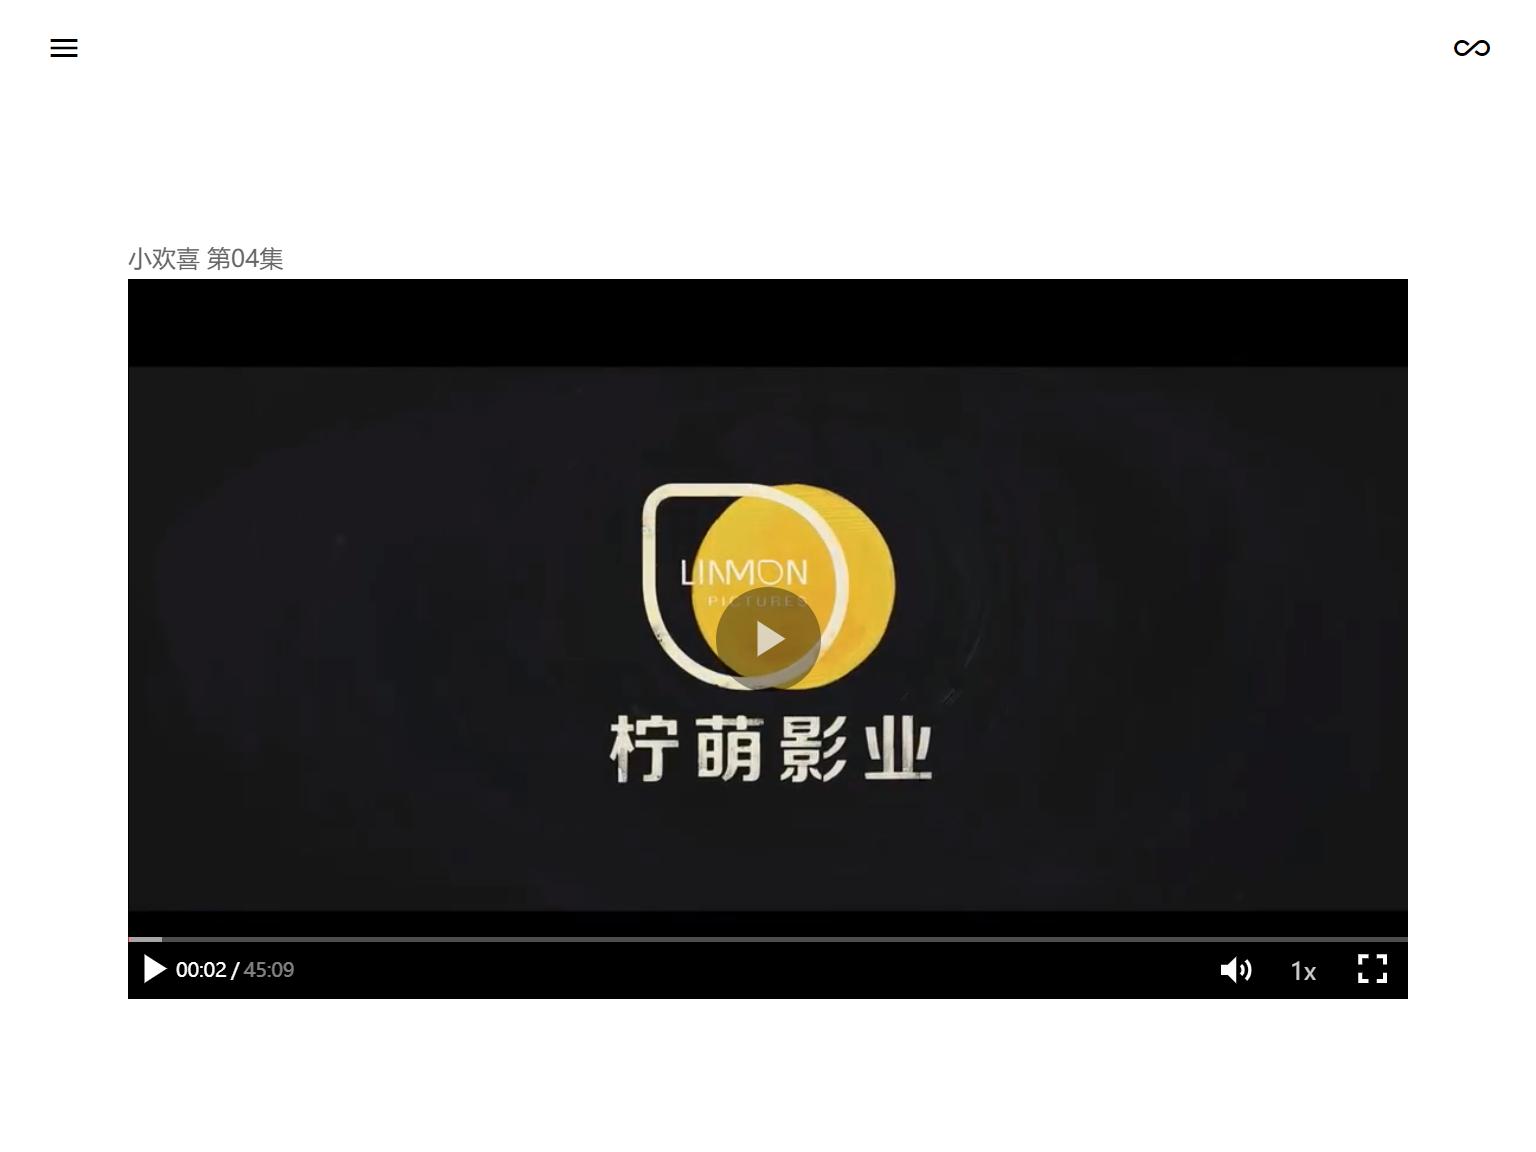 FireShot Capture 006 - 资源播放器 - m3u8.hunlongyu.fun.png